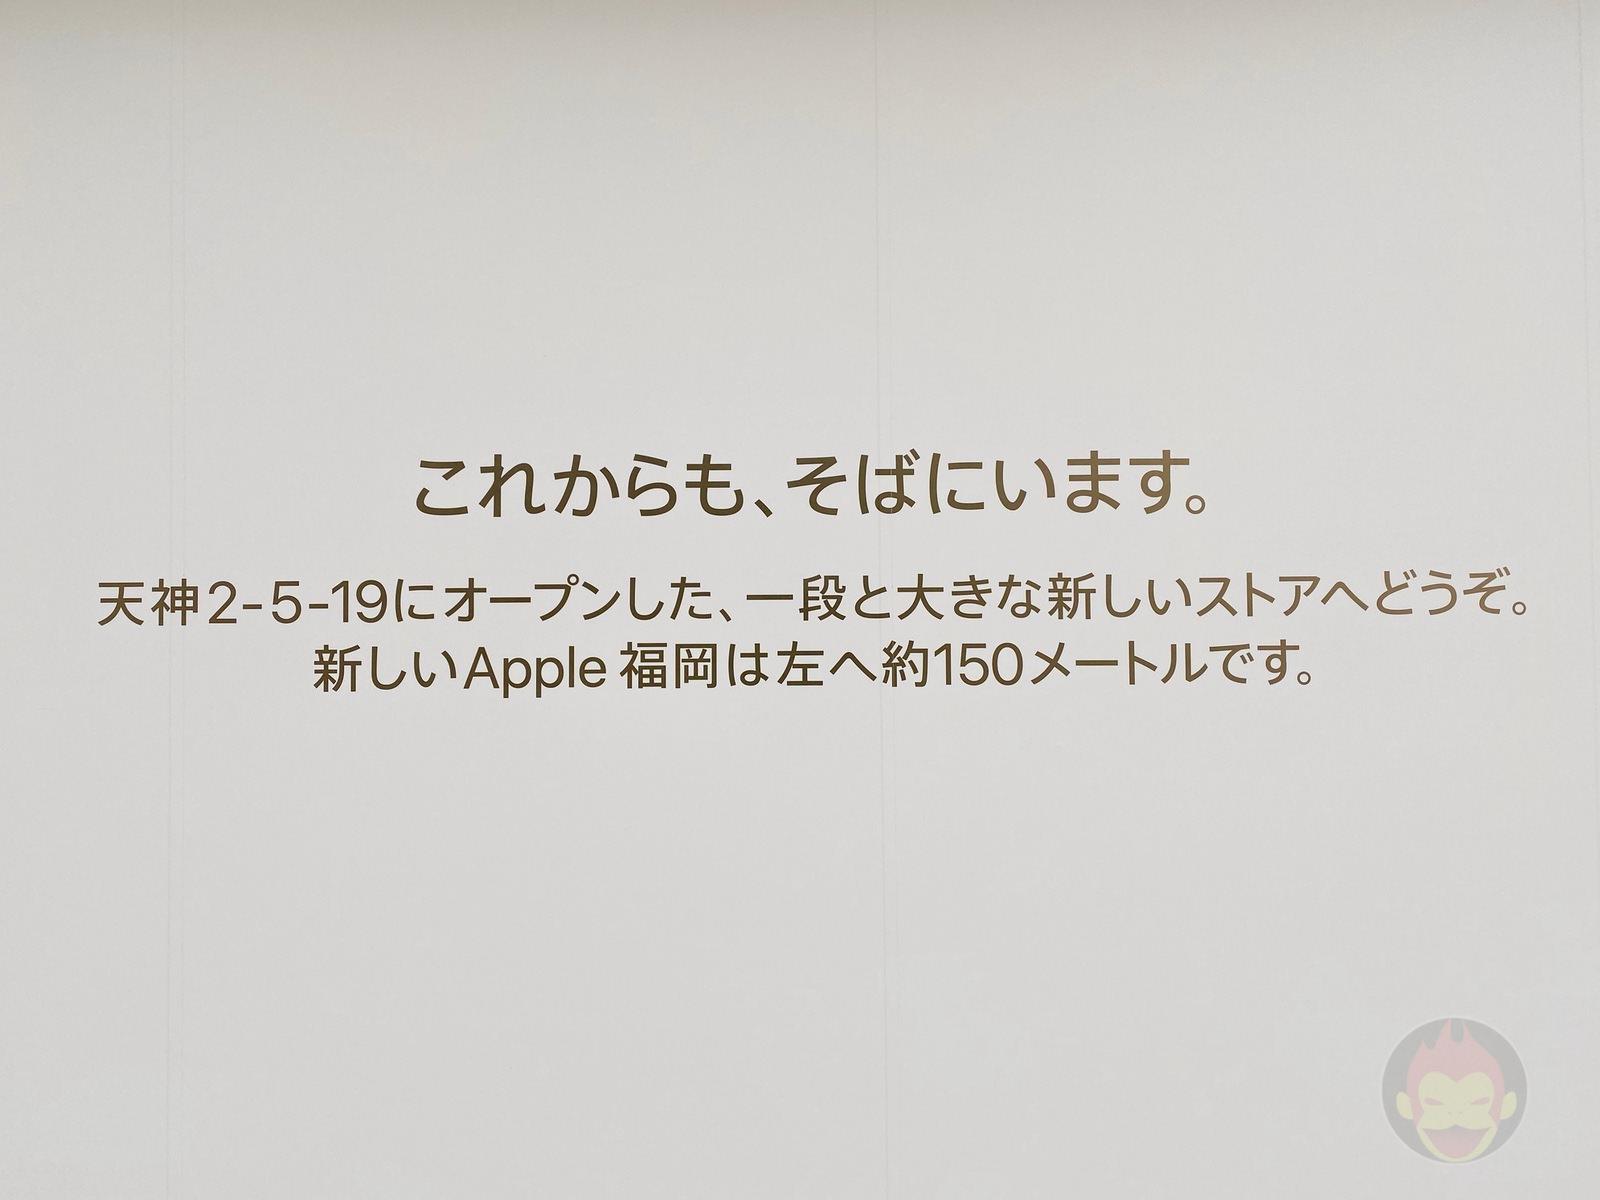 Apple-Fukuoka-Tenjin-End-02.jpg